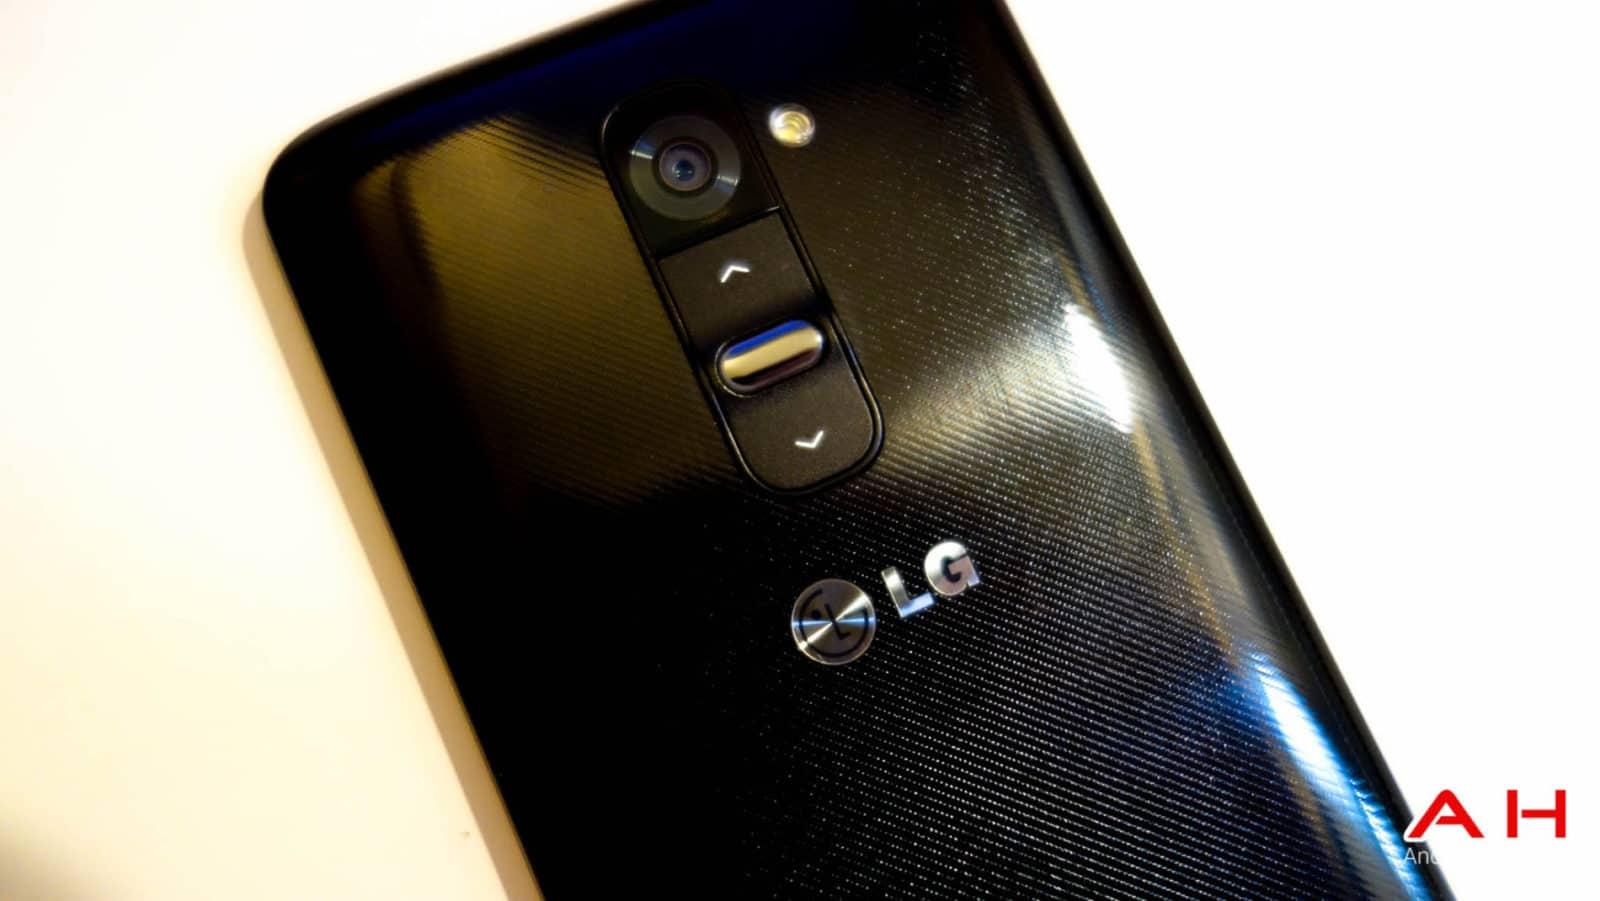 Sprint Lg G2 Receiving Android 5 0 Lollipop Update